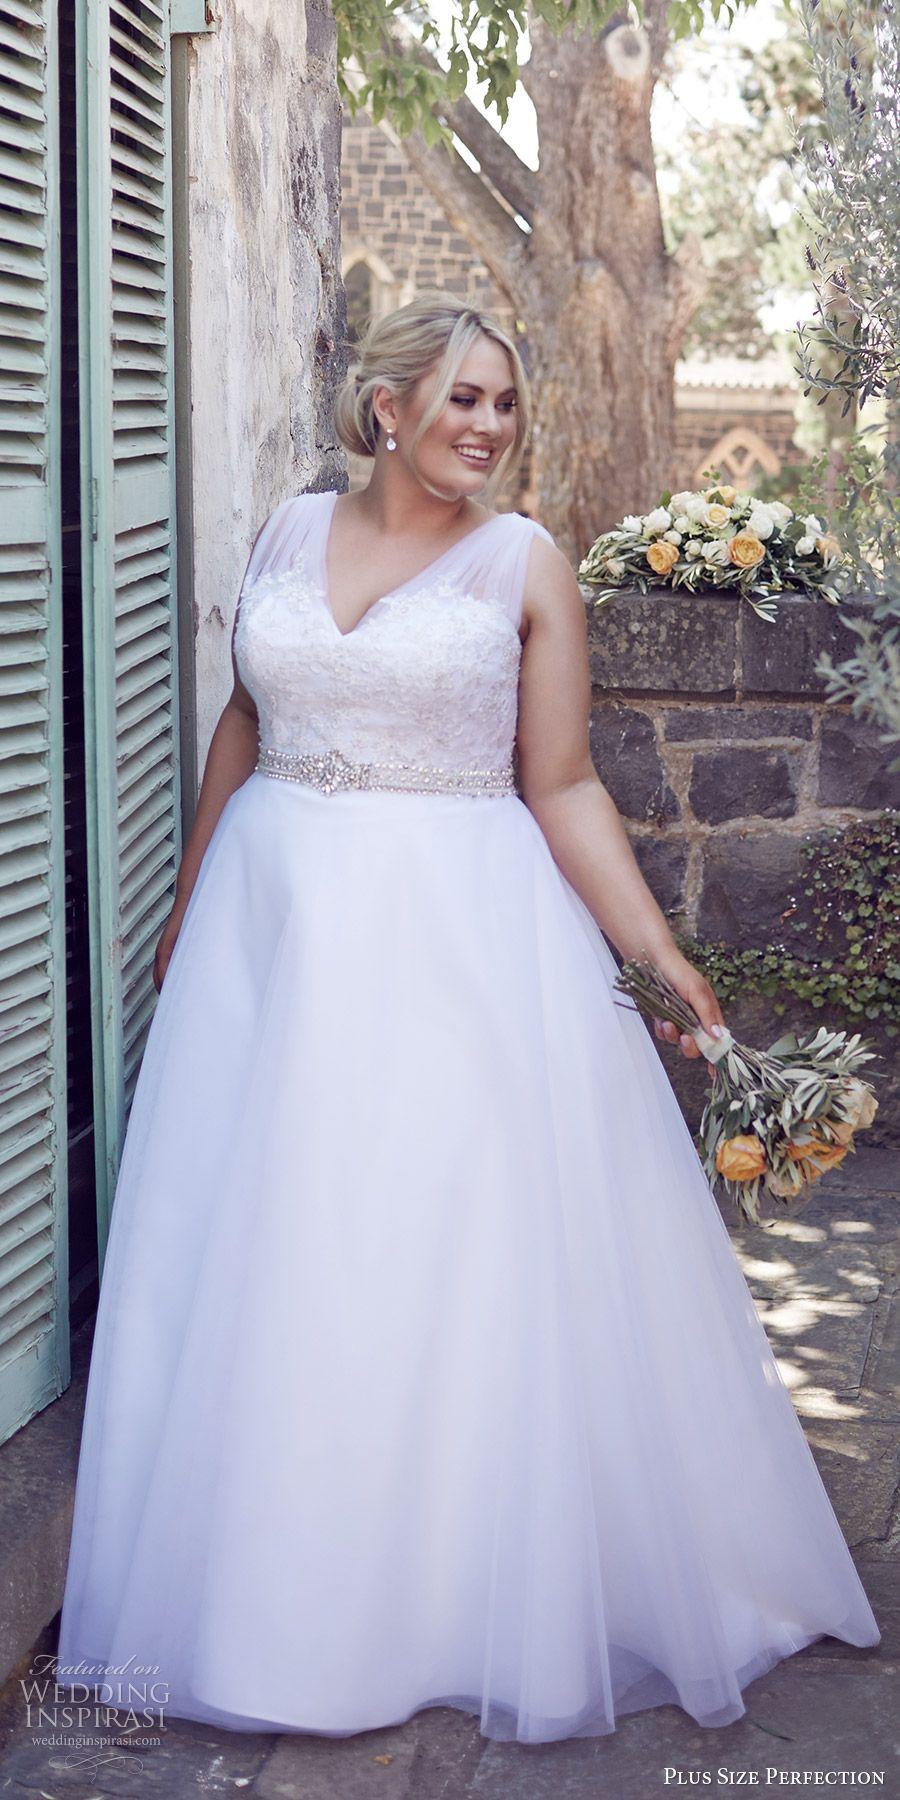 Plus size perfection wedding dresses u ucitus a love storyud campaign